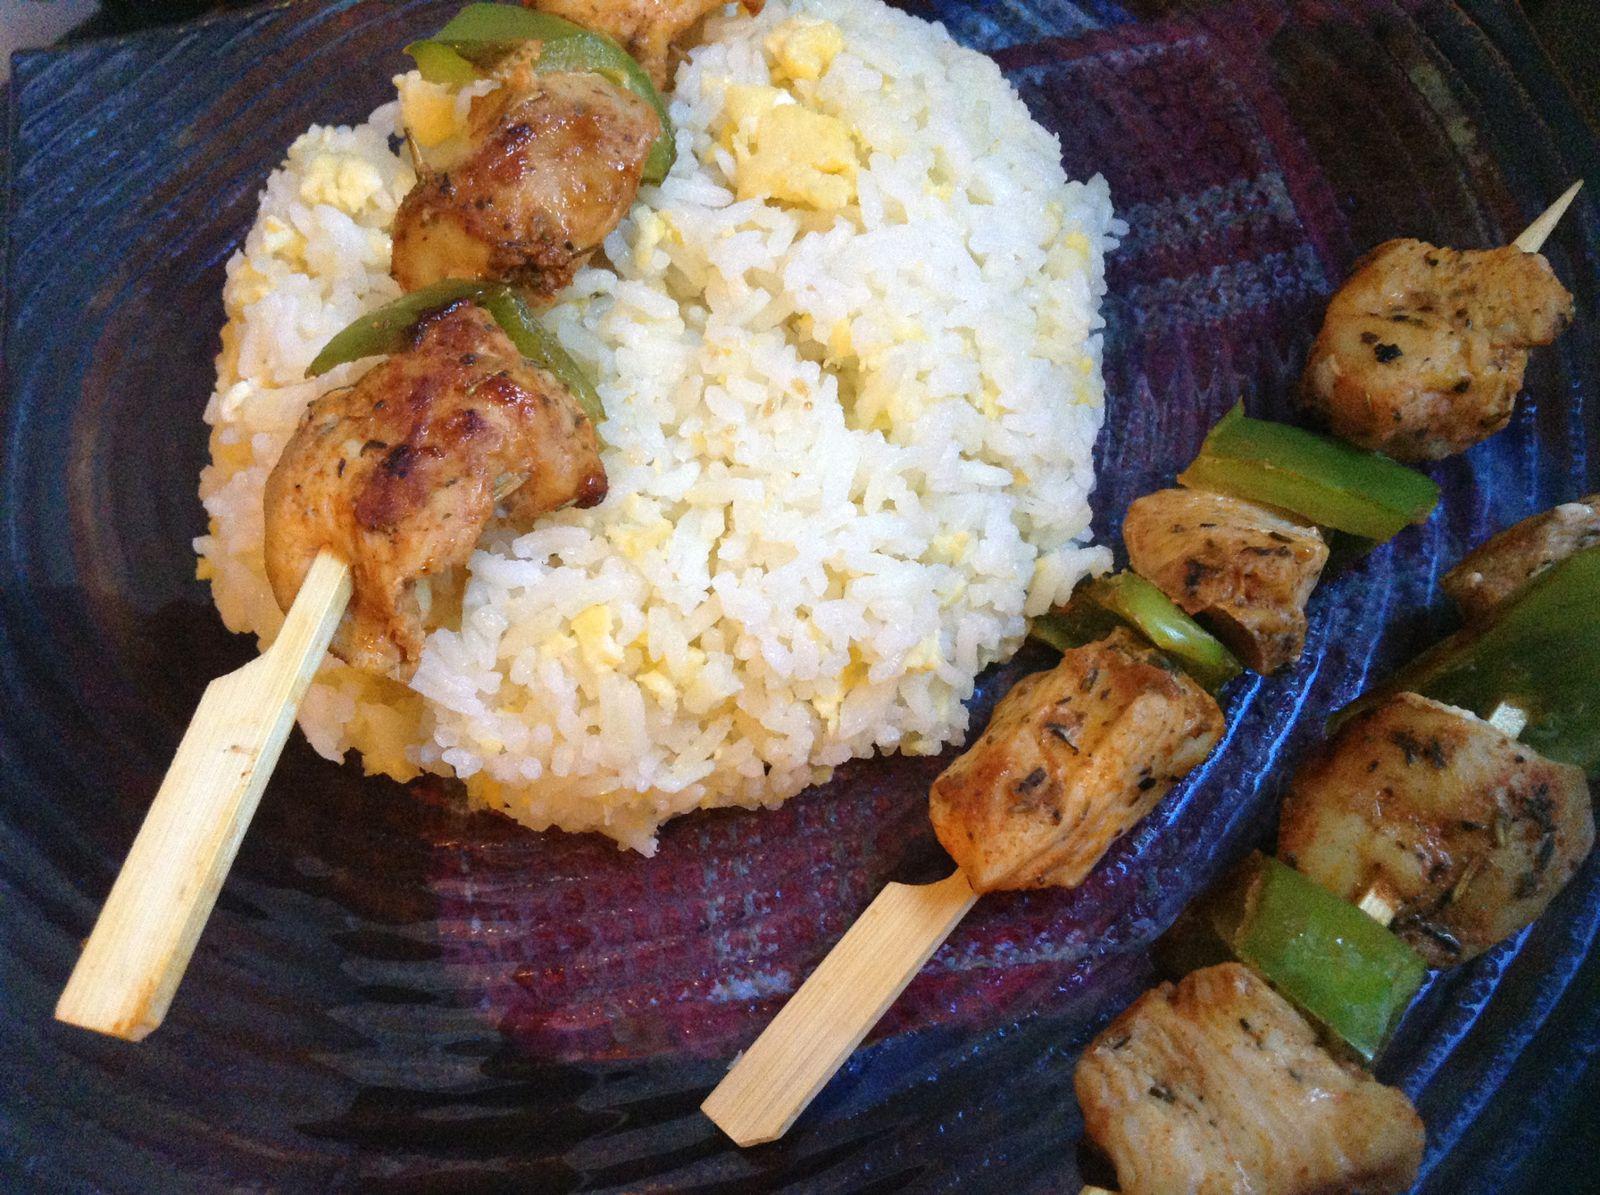 Brochettes d 39 escalopes pour ramadan - Cuisine maghrebine pour ramadan ...